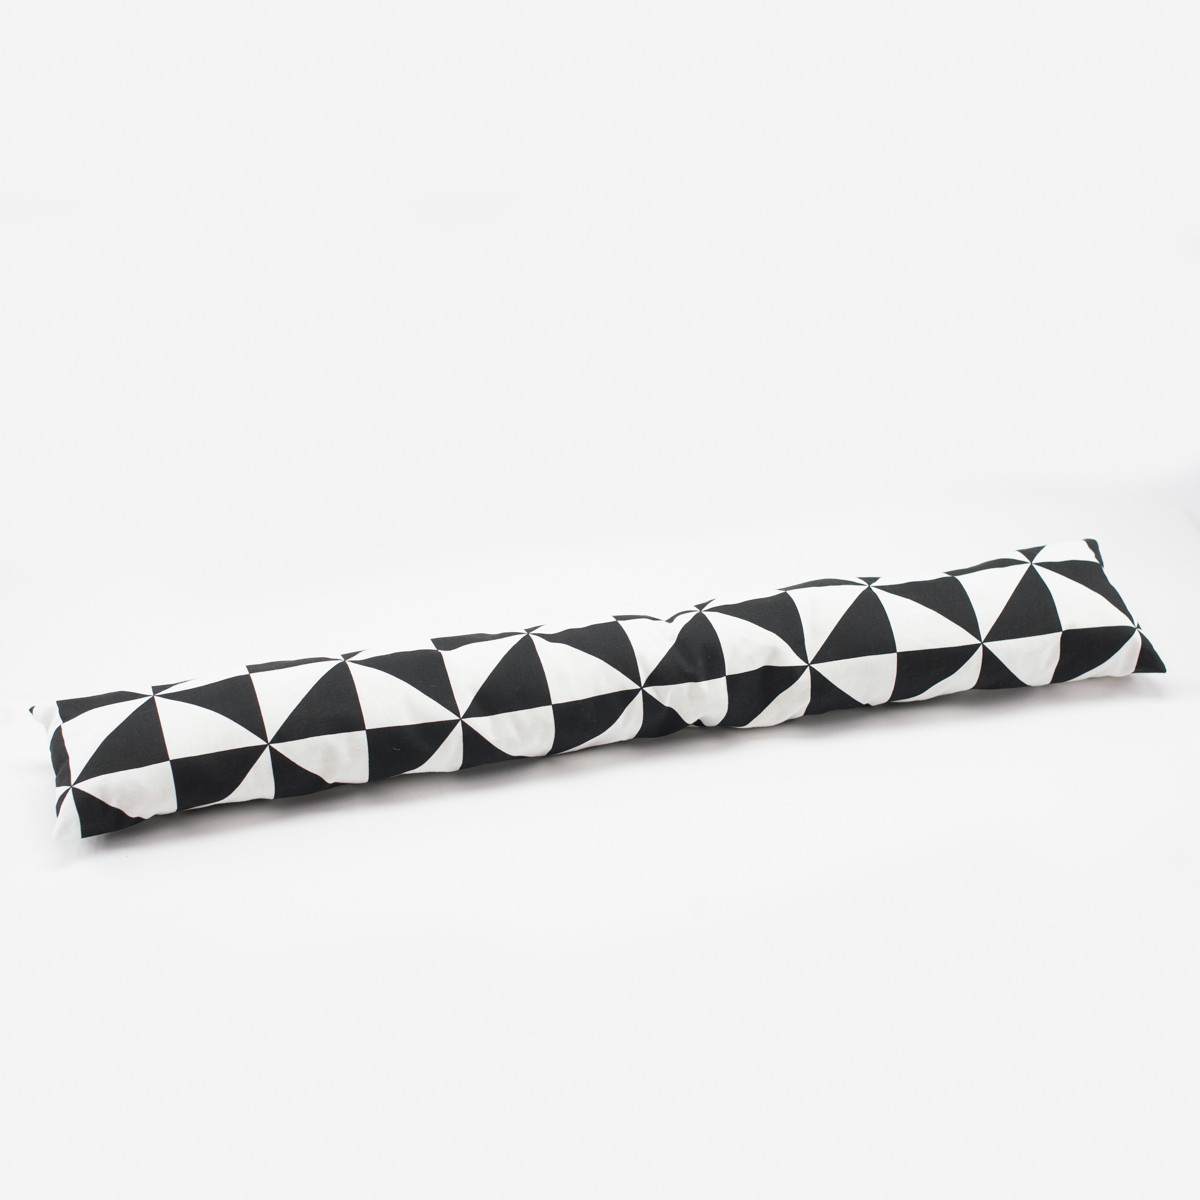 zugluftstopper retromuster schwarz wei 80 bis 130cm lang wohntextilien kissen zugluftstopper. Black Bedroom Furniture Sets. Home Design Ideas